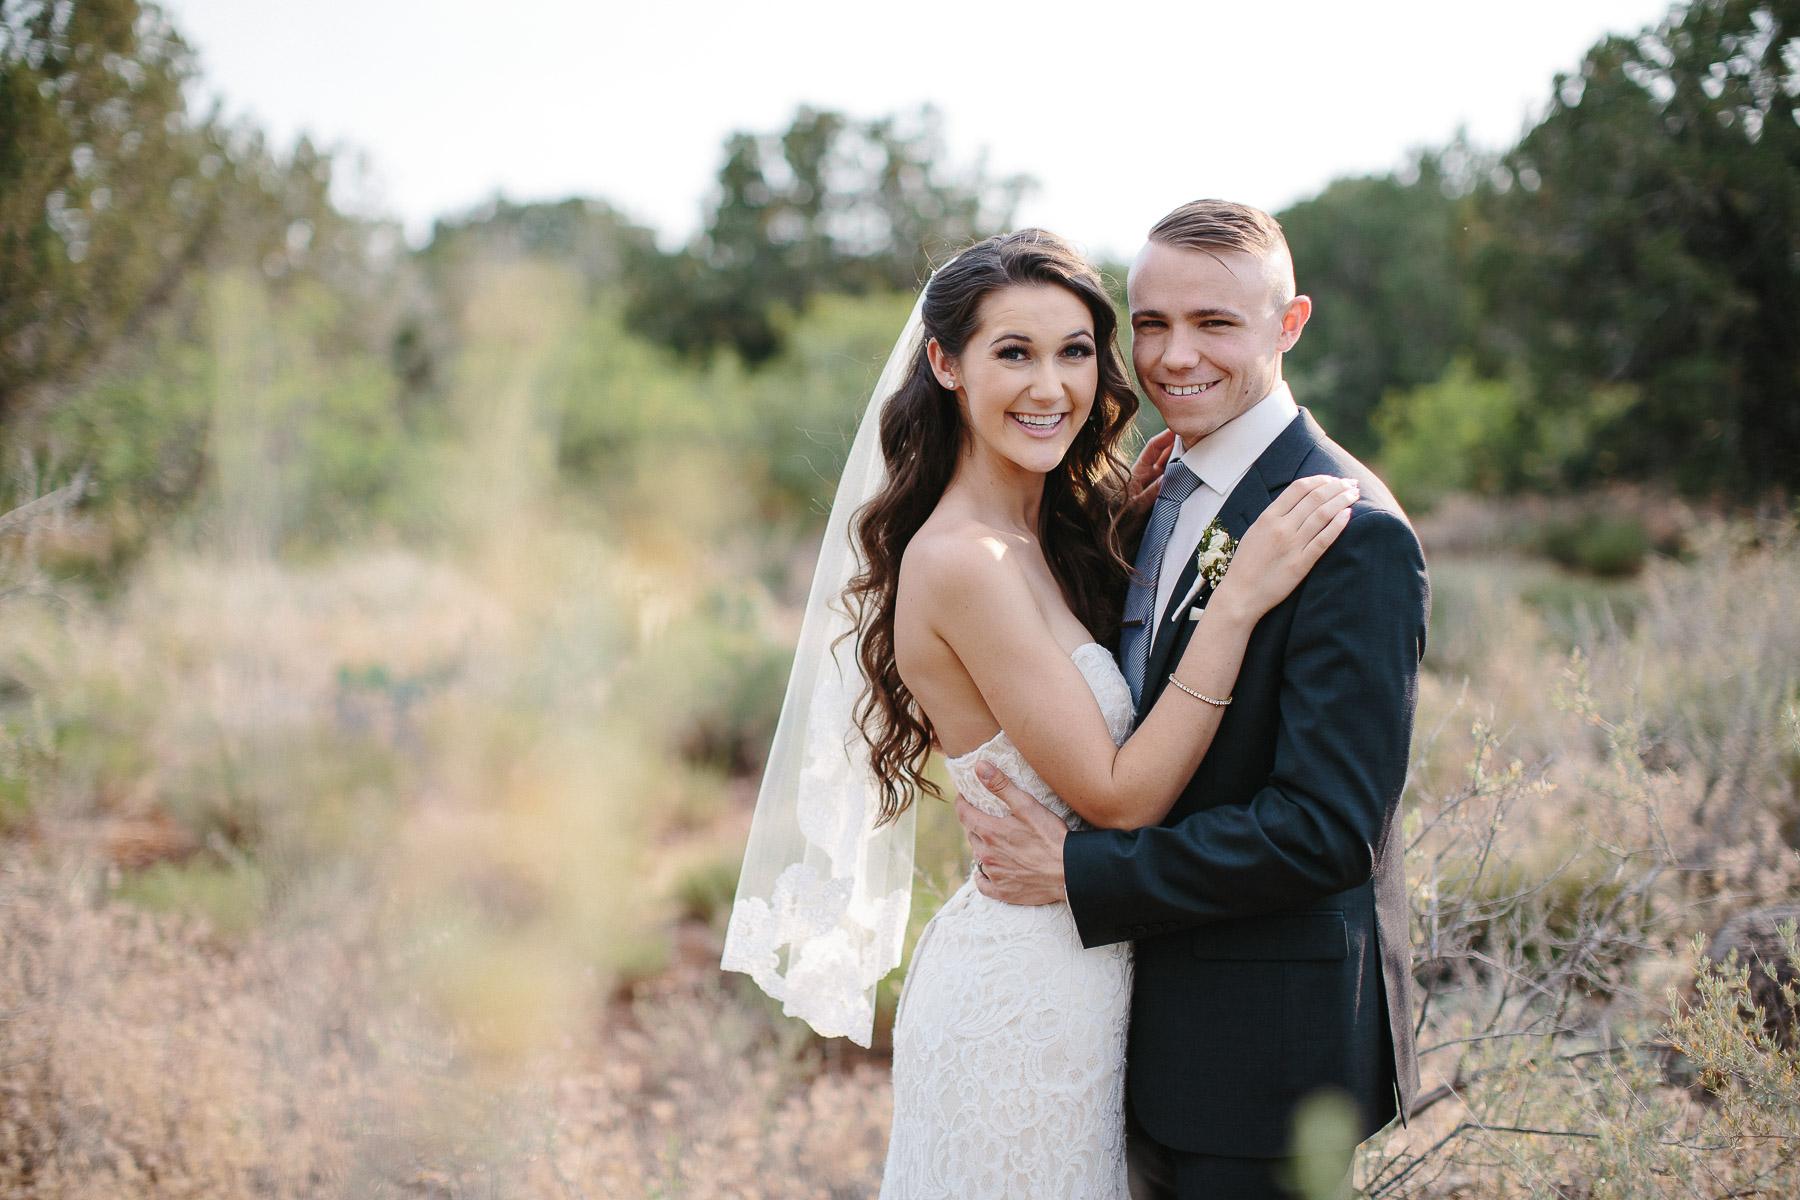 170528-Malkin-Wedding-Sedona-Arizona-Wedding-Photography-Sky-Ranch-Lodge-1030.jpg